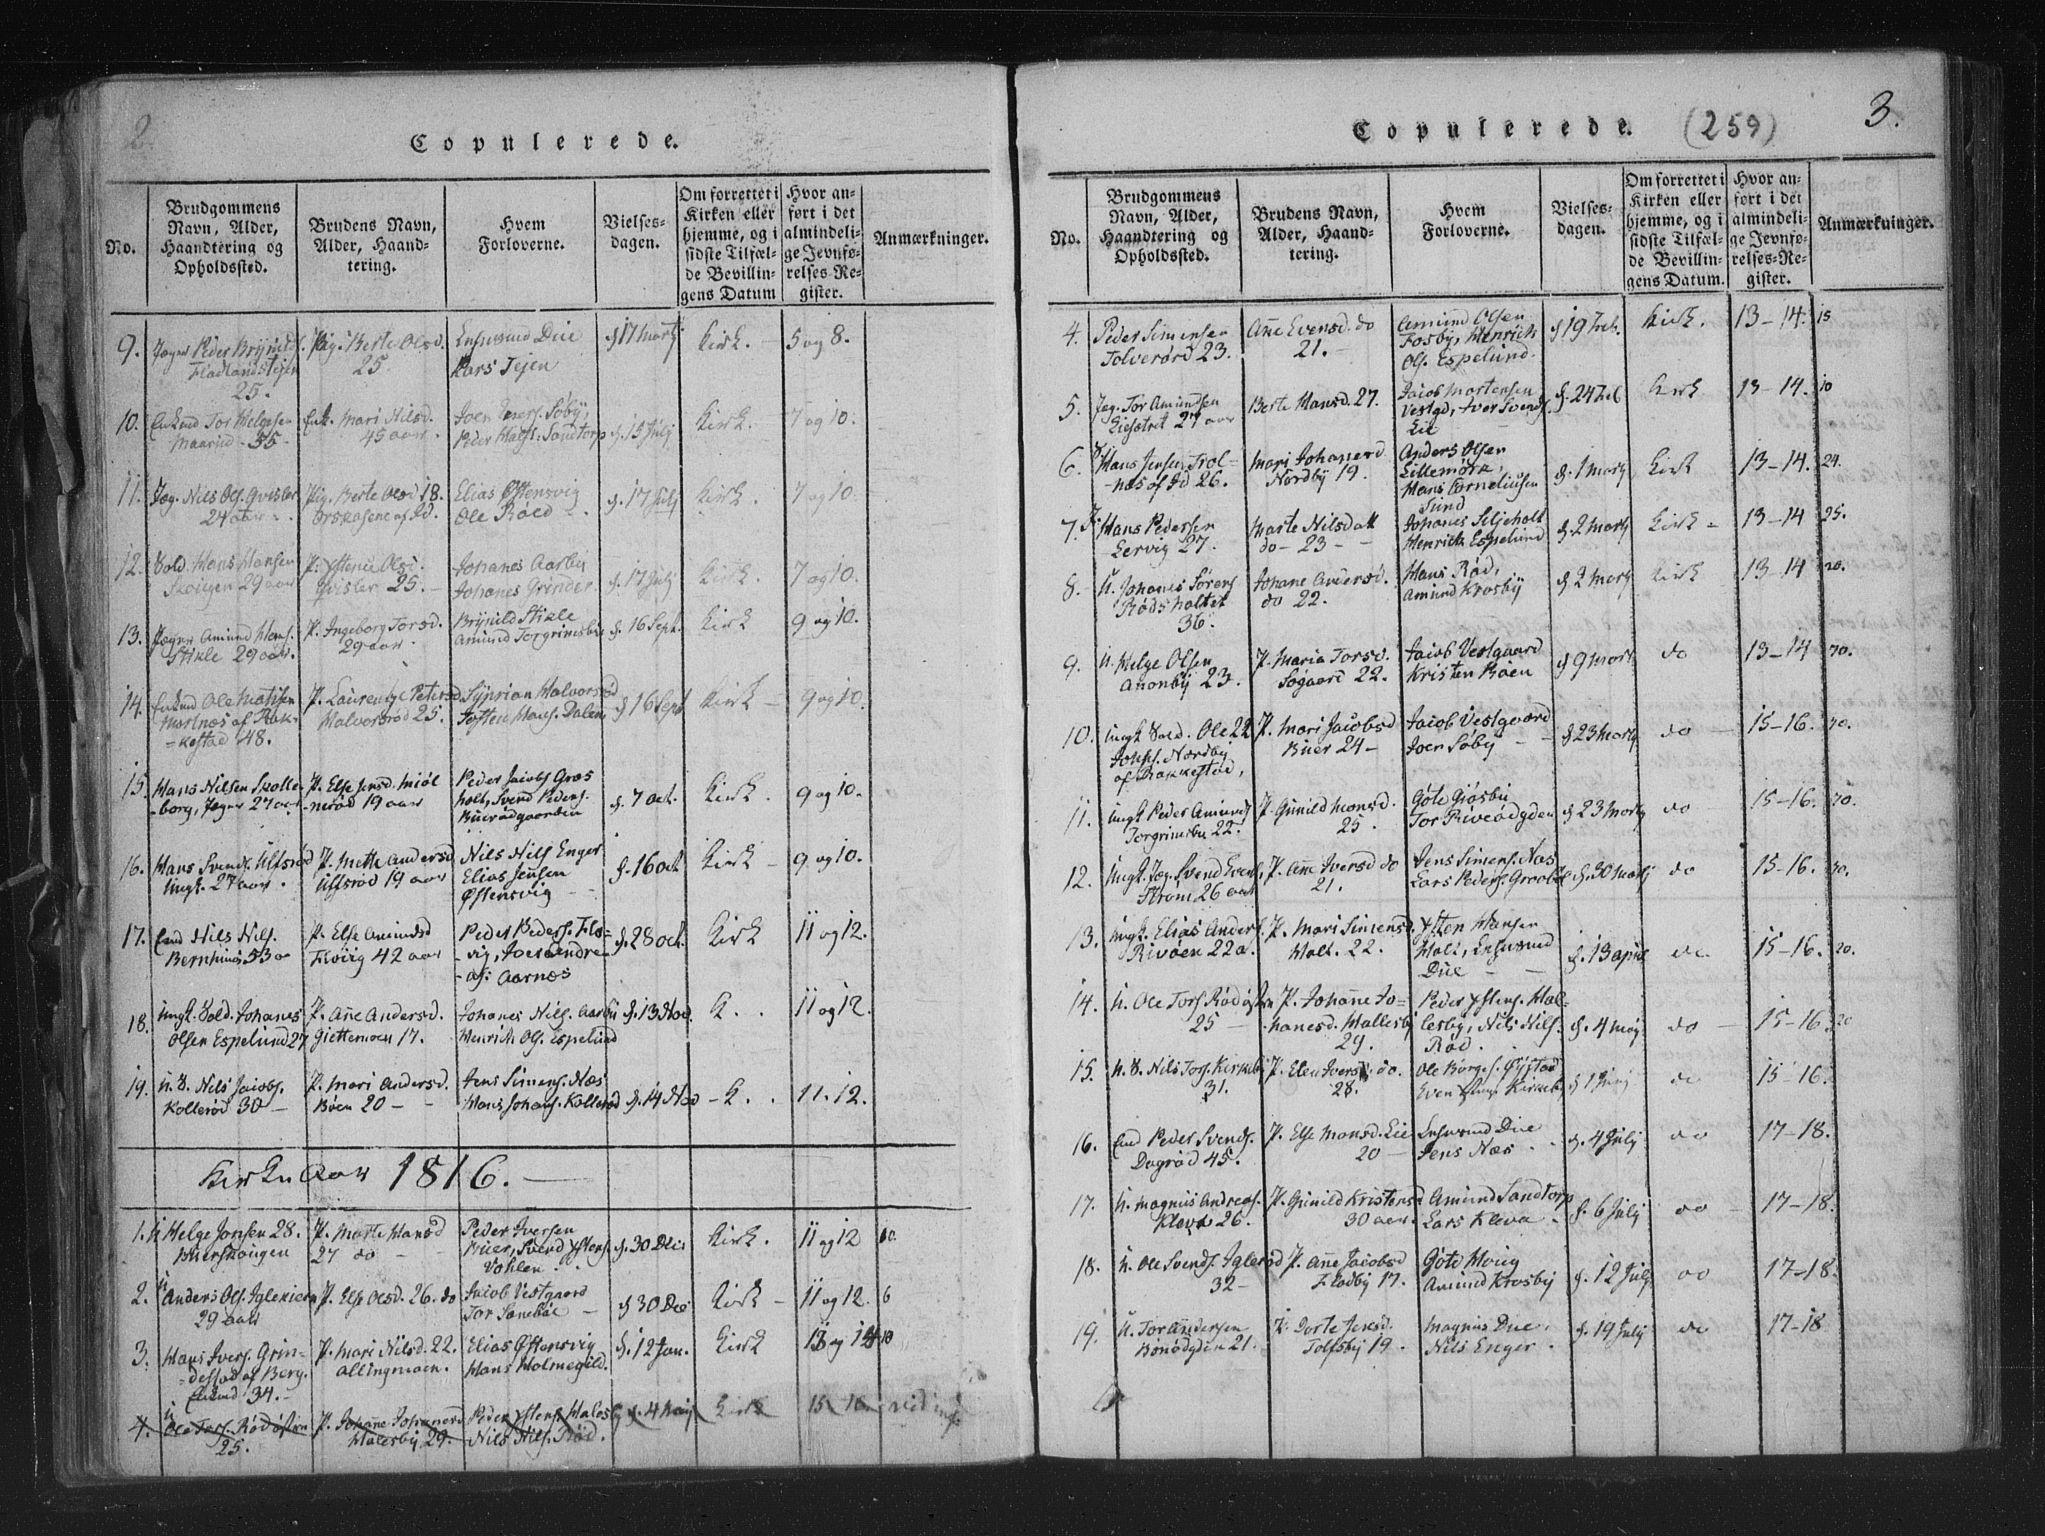 SAO, Aremark prestekontor Kirkebøker, F/Fc/L0001: Ministerialbok nr. III 1, 1814-1834, s. 2-3